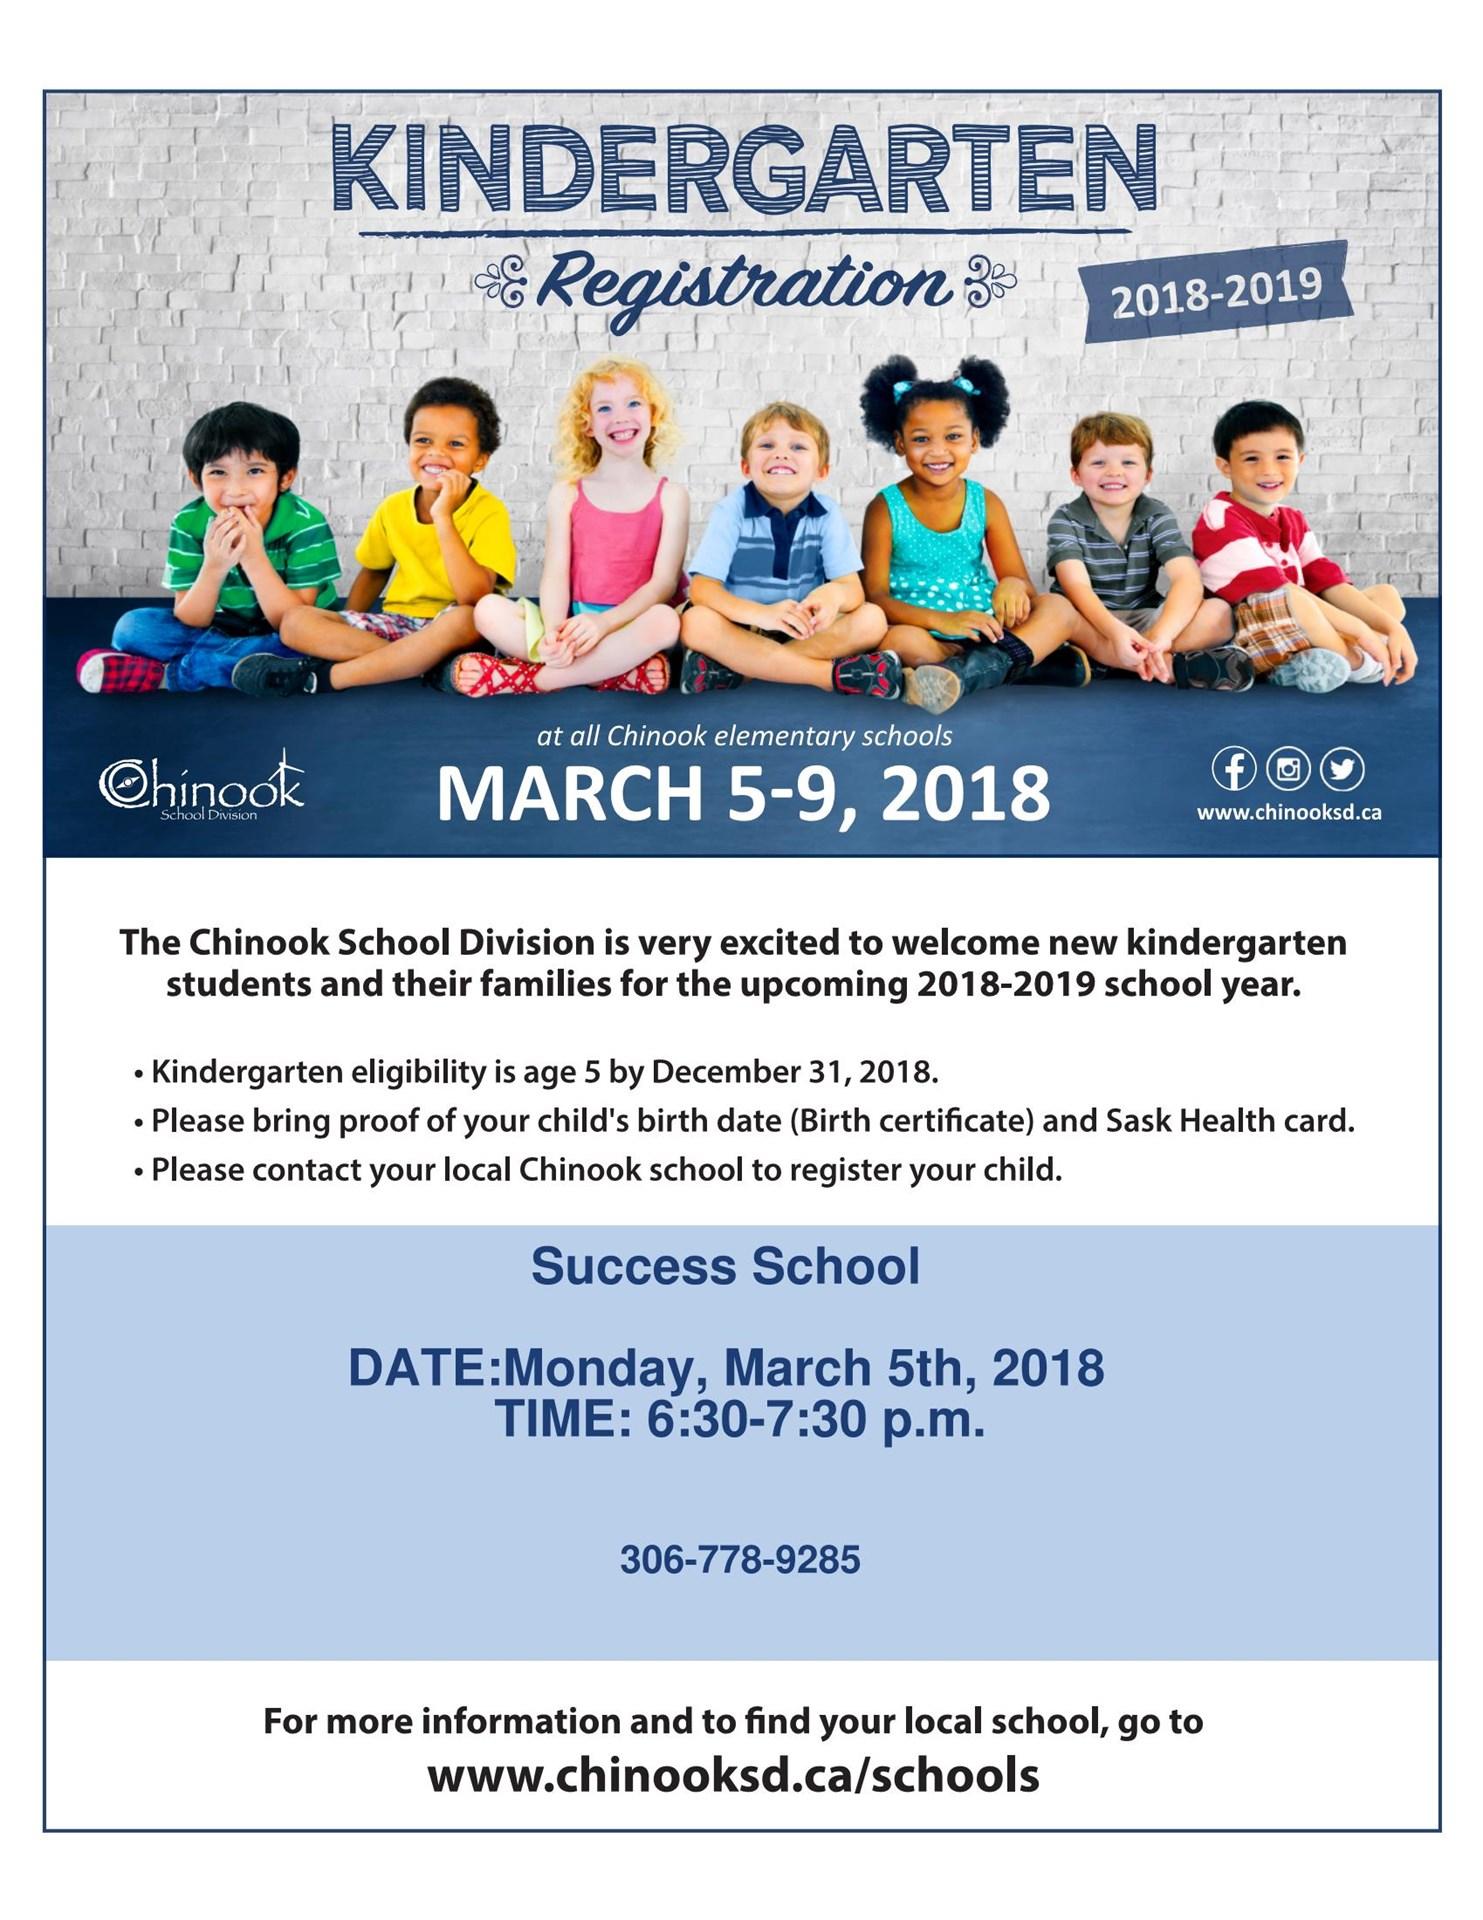 Success school success school 2018 2019 kindergarten registration aiddatafo Image collections